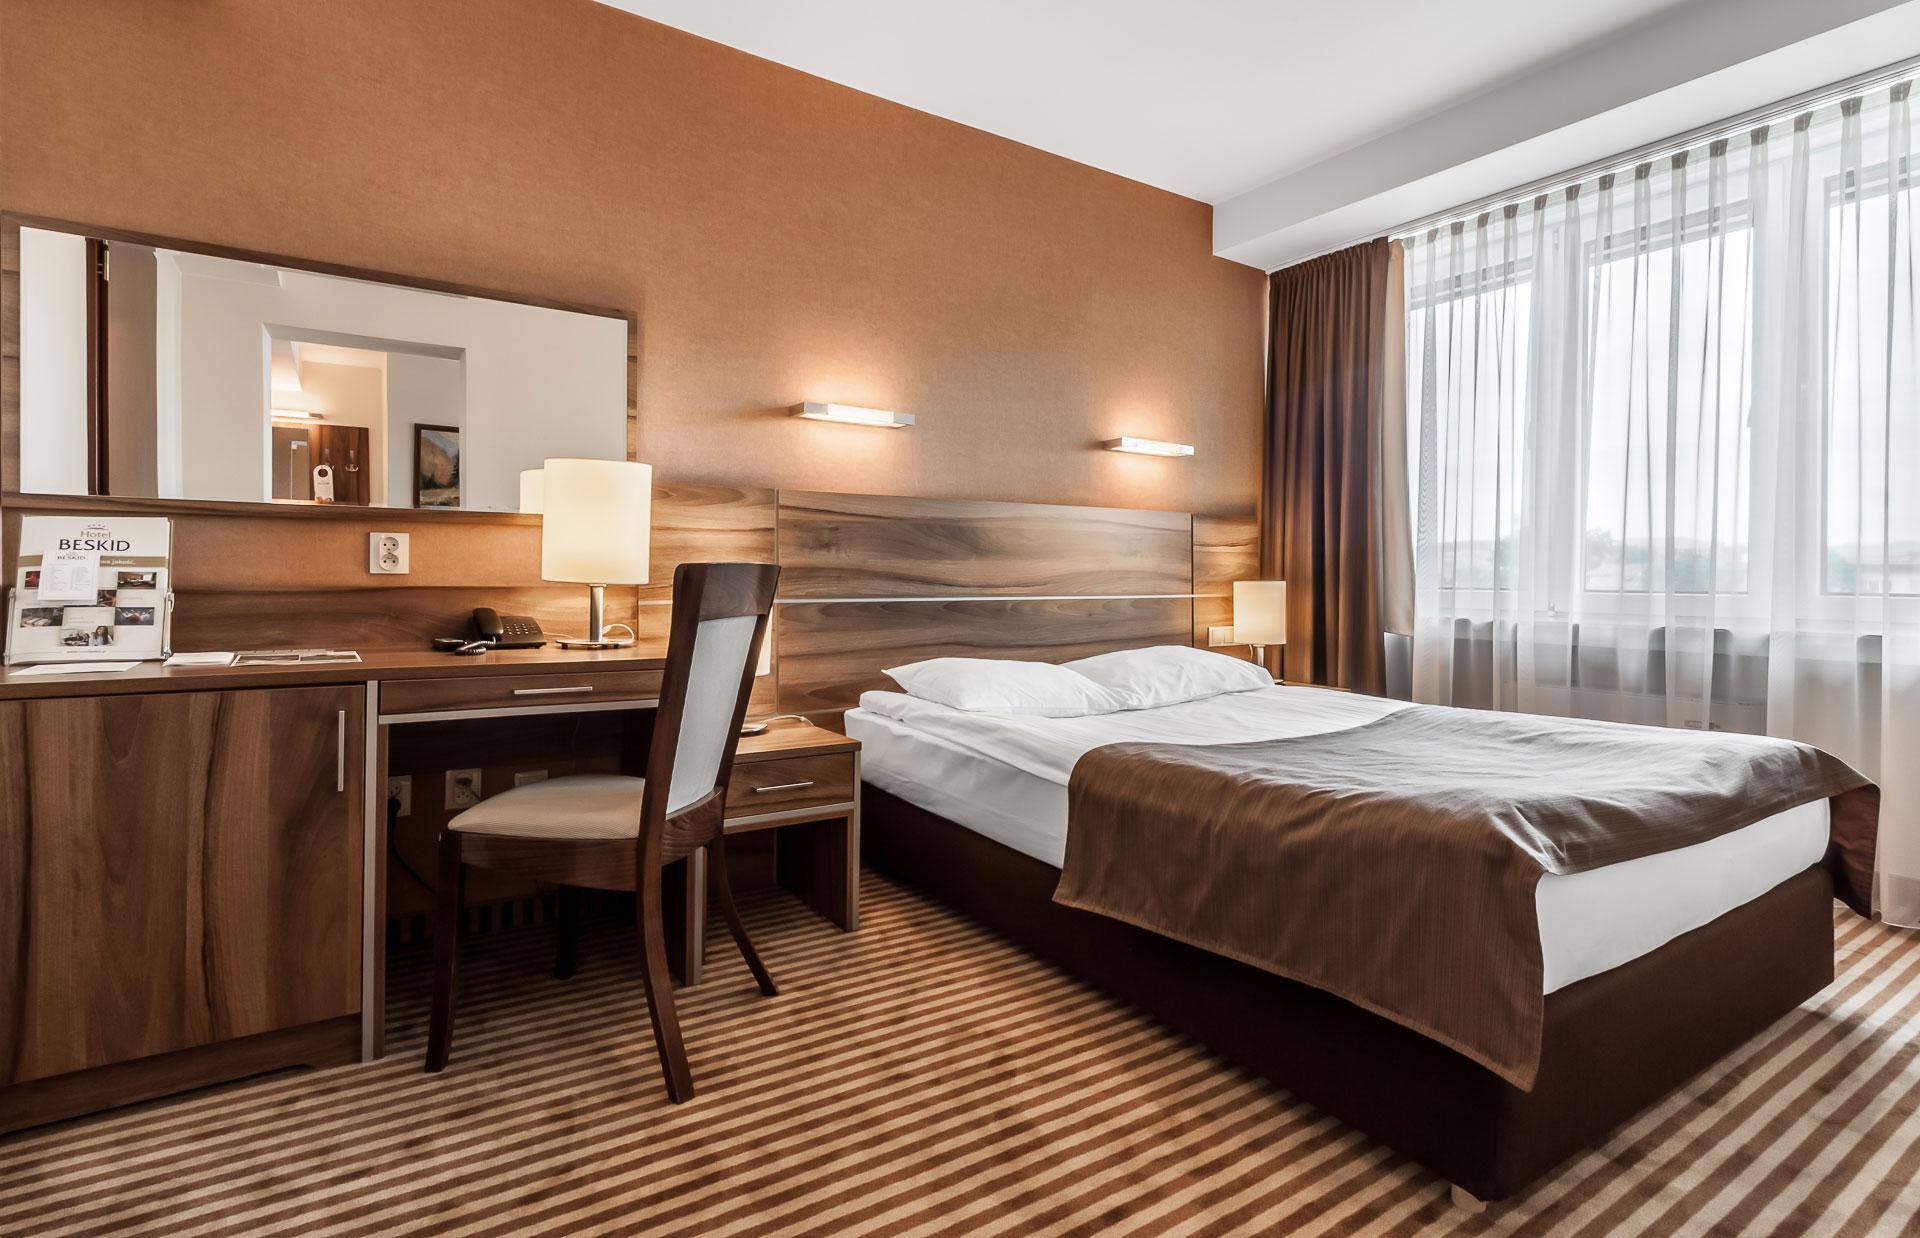 Double room - Hotel Beskid****